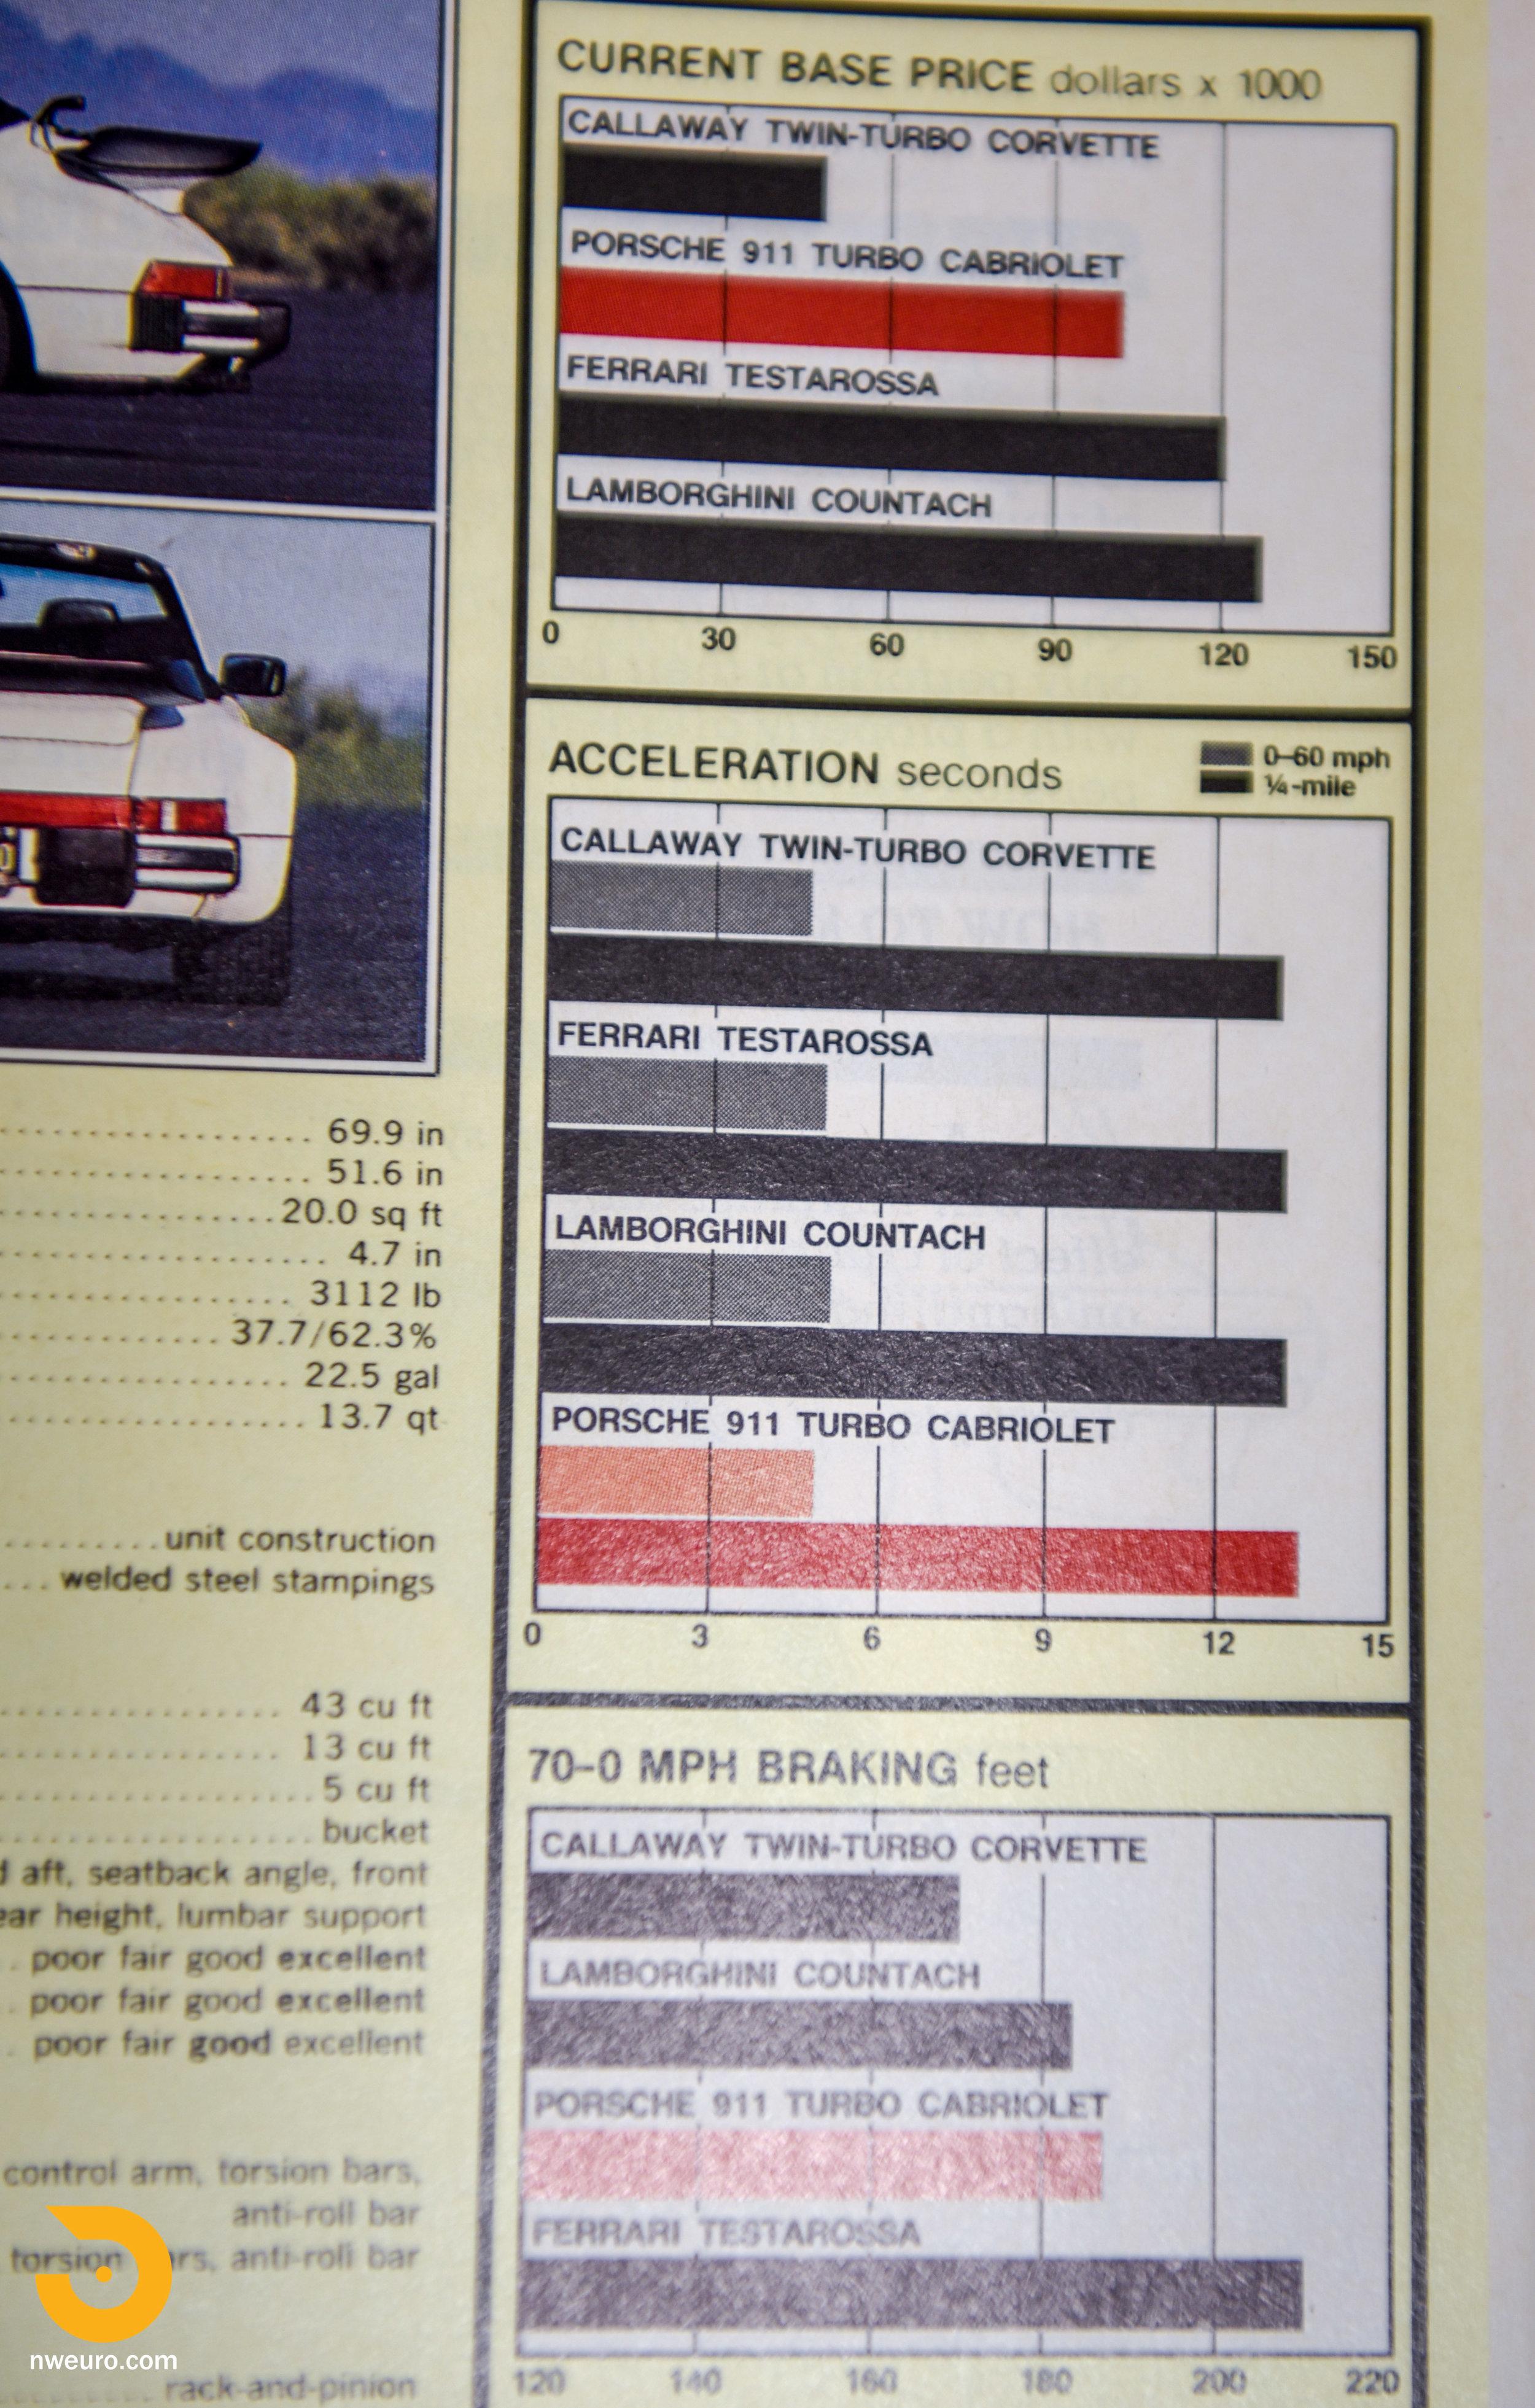 1987 Porsche 930 Slant Nose Cab Details-12.jpg